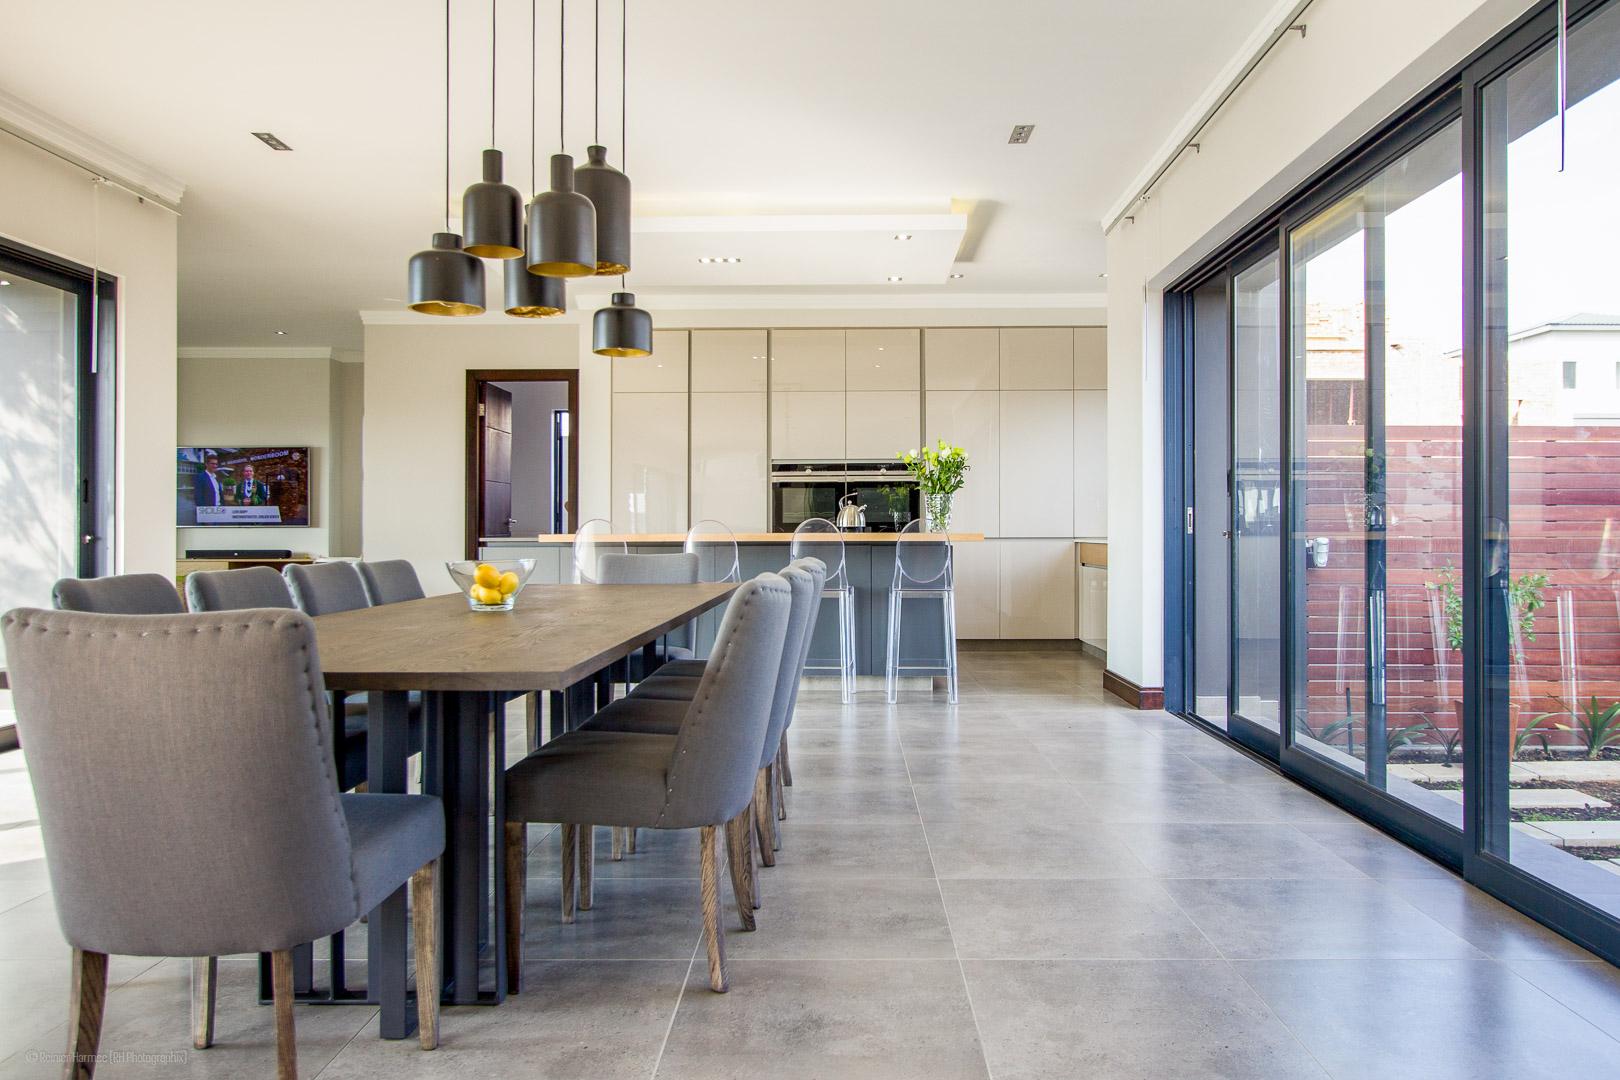 RHPX_Portfolio_House VBS Interior-1